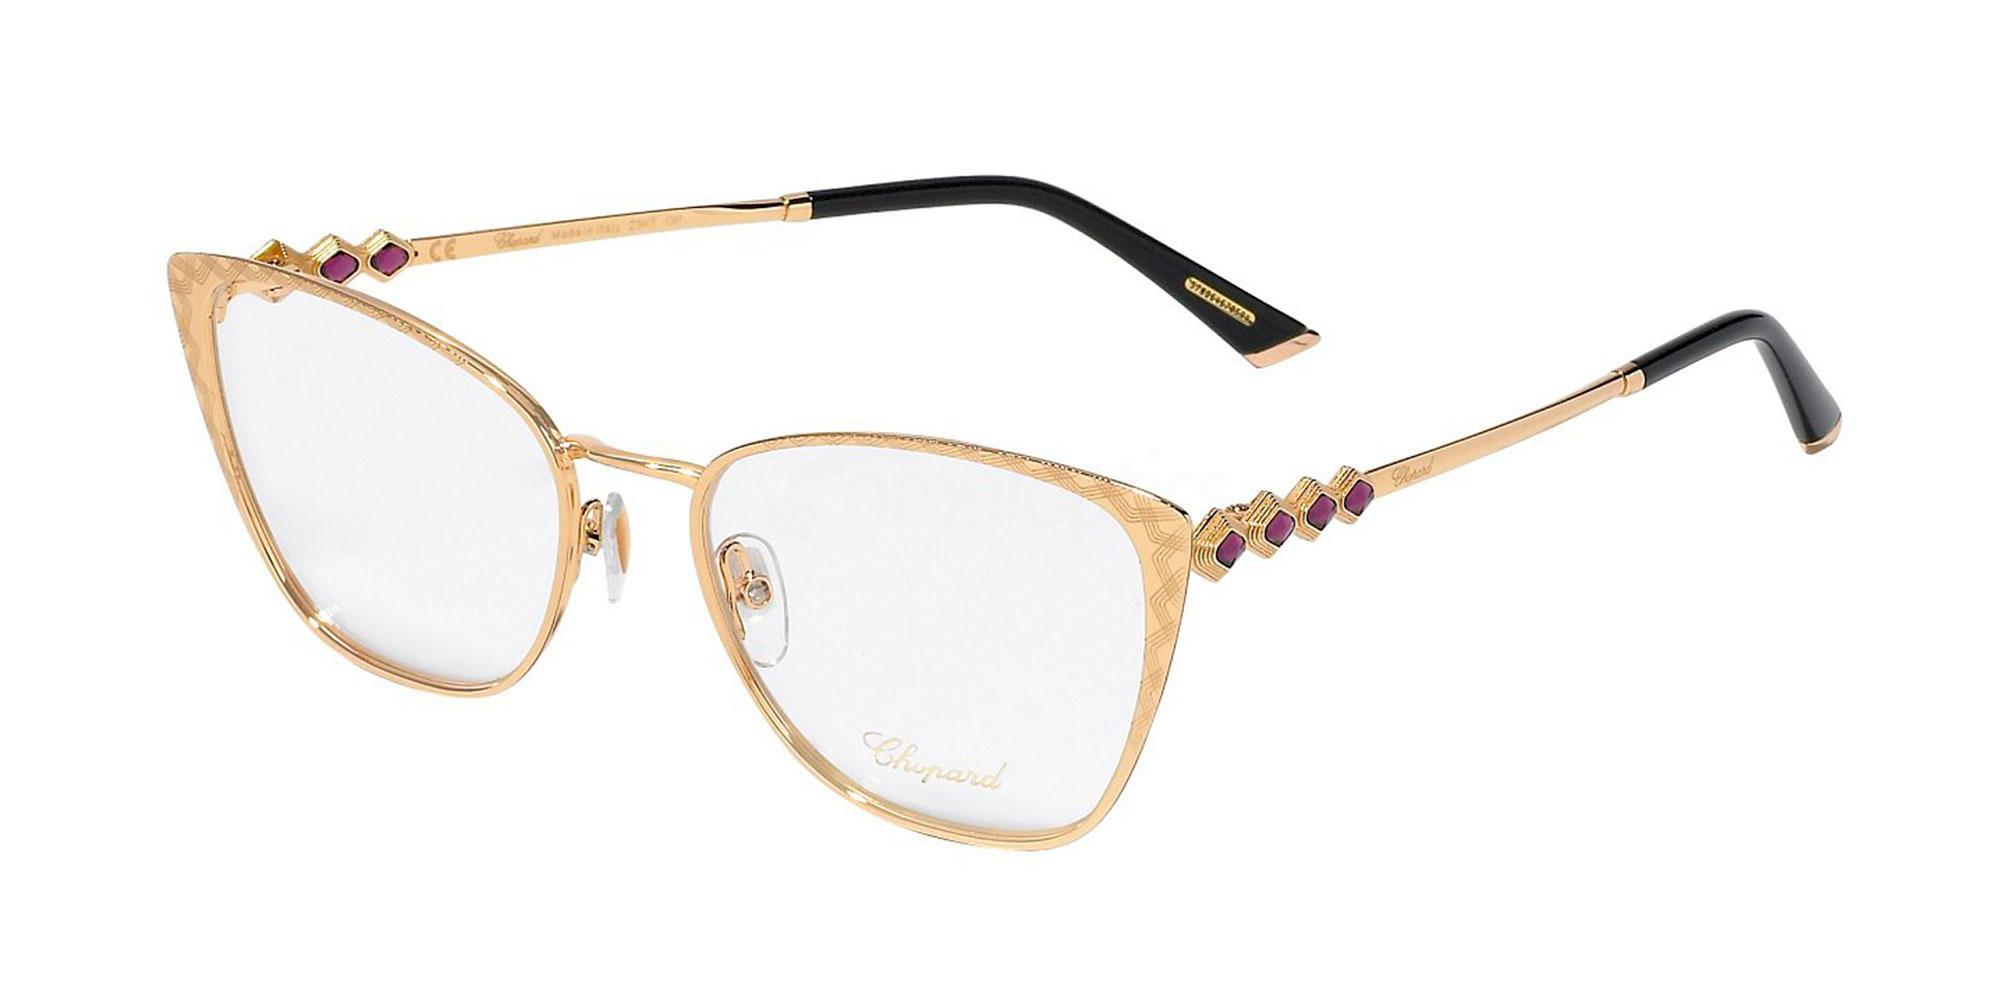 0300 VCHD51S Glasses, Chopard